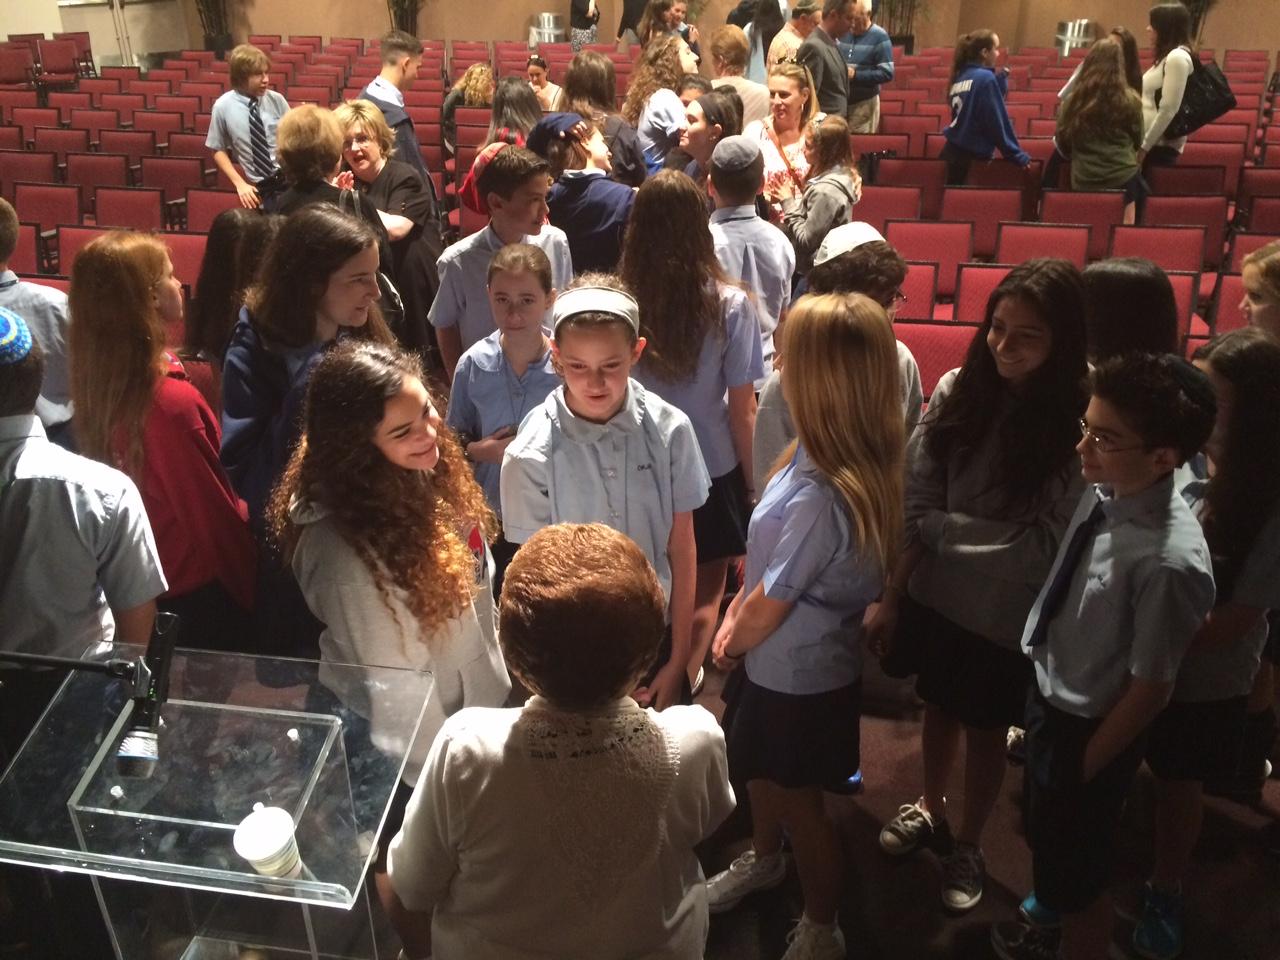 Yaffa Englander and her classmates speak with Holocaust survivor Rena Finder